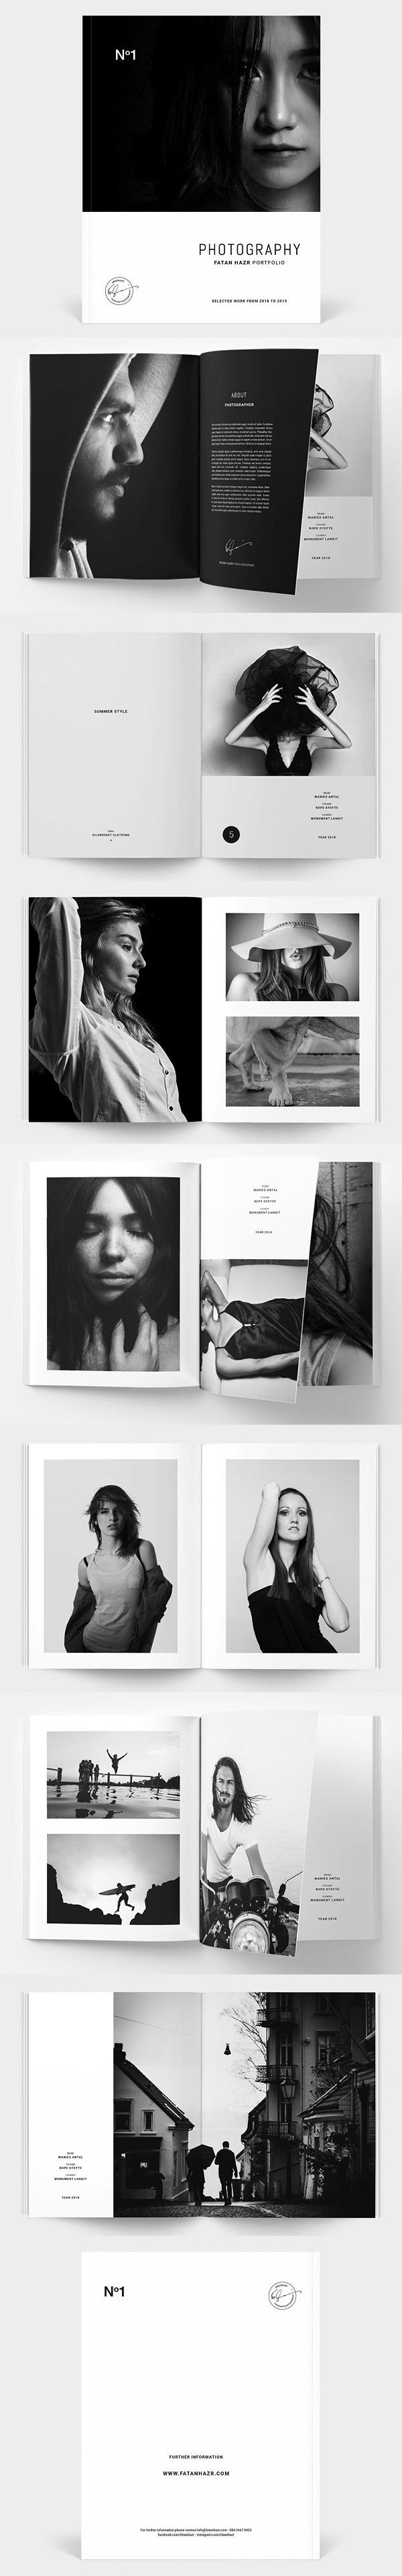 Clean Photography Portfolio